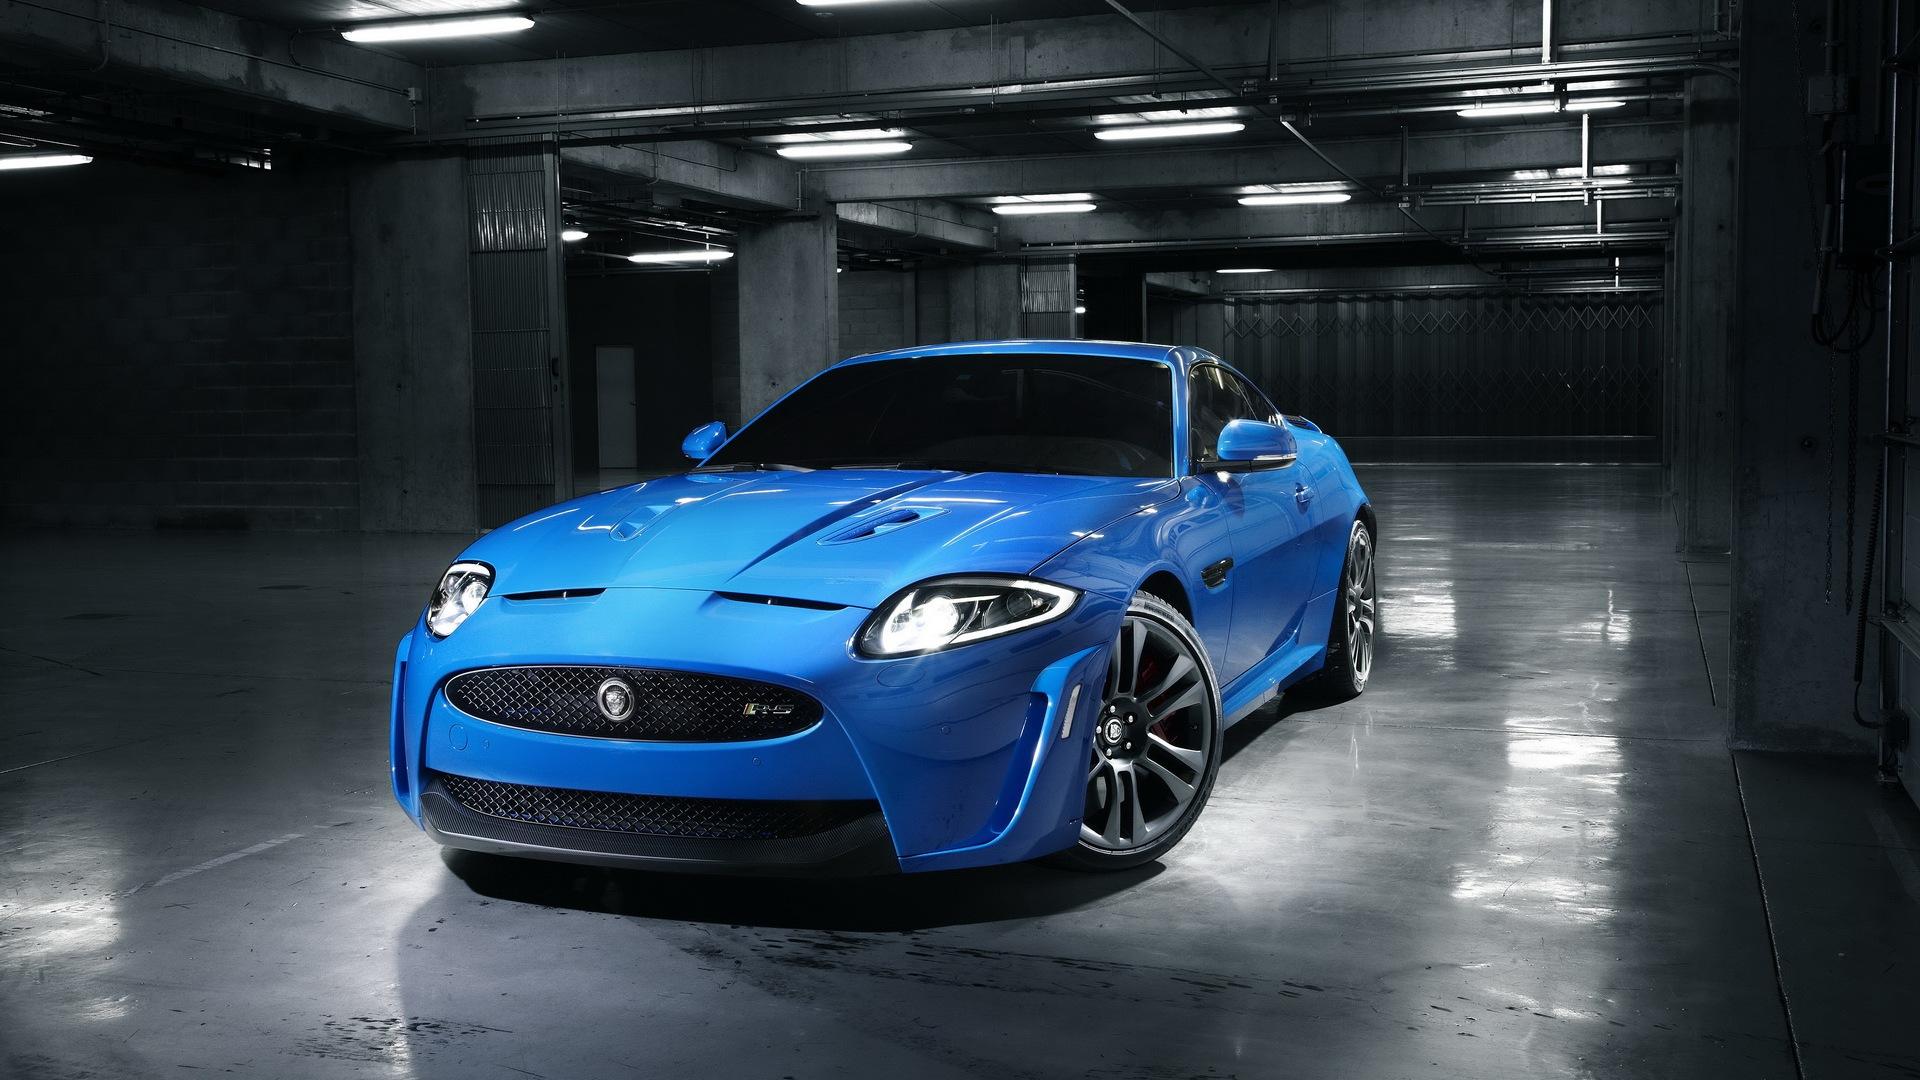 Mobil Sport Full Hd Jaguar HD Wallpaper